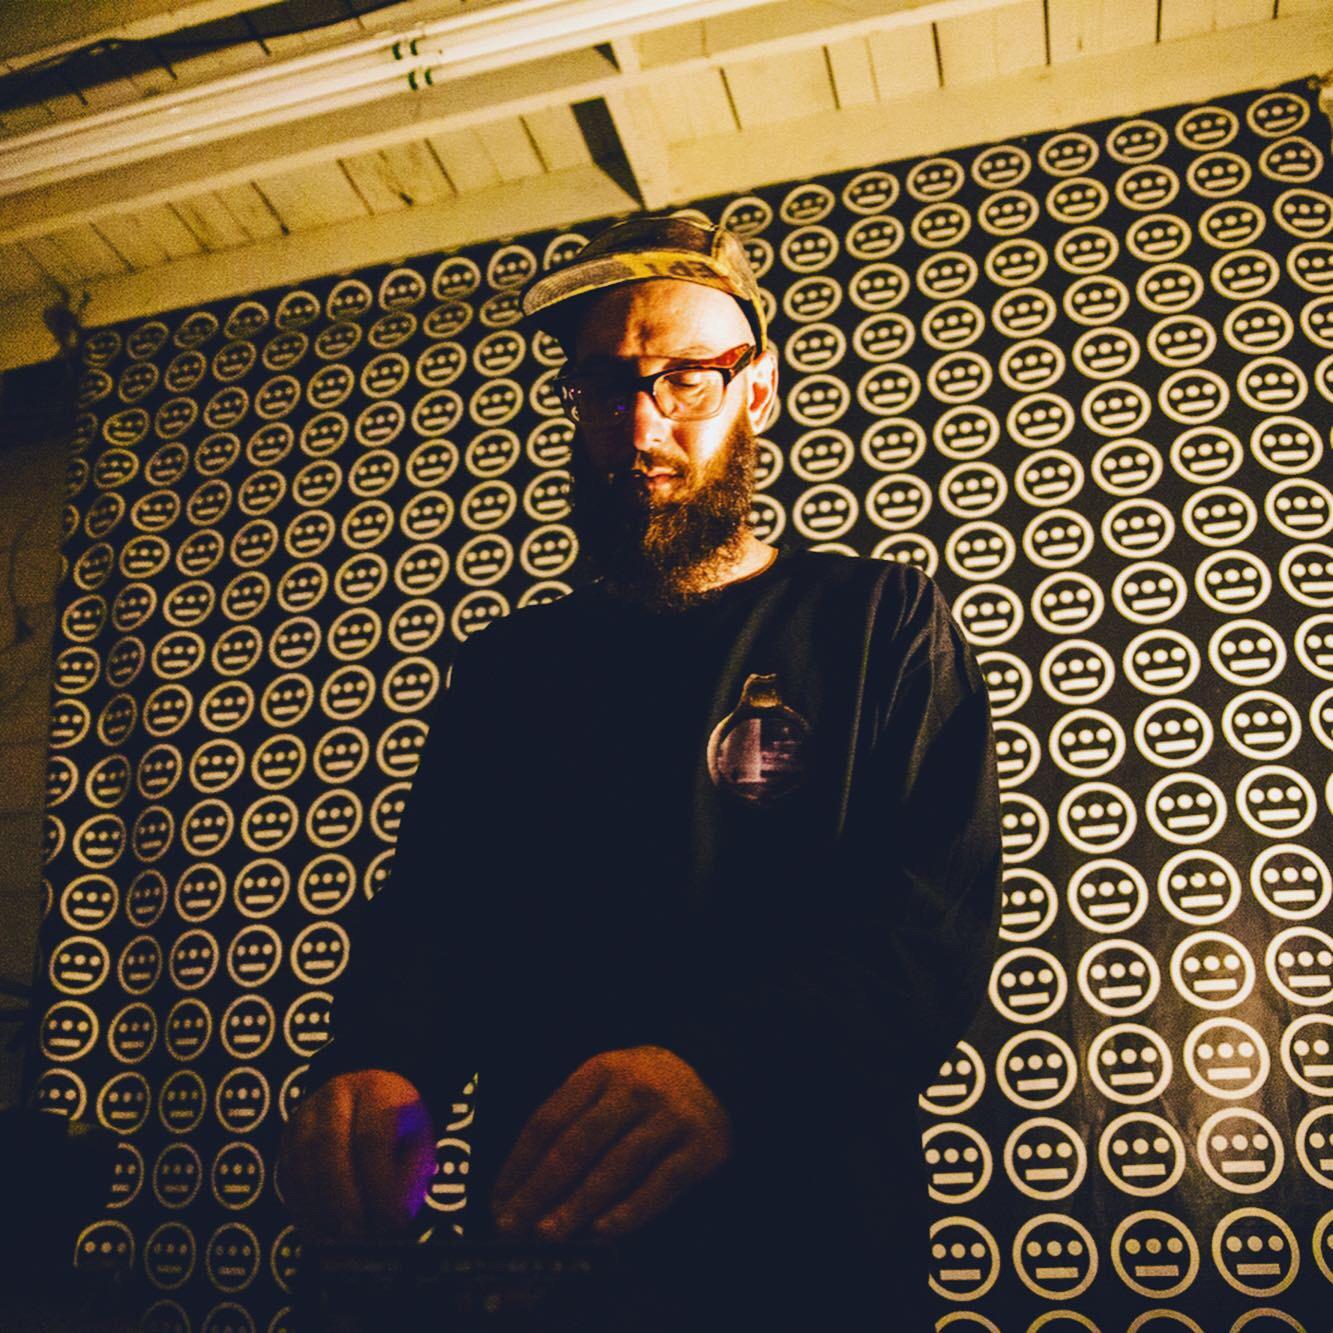 DJ Basta